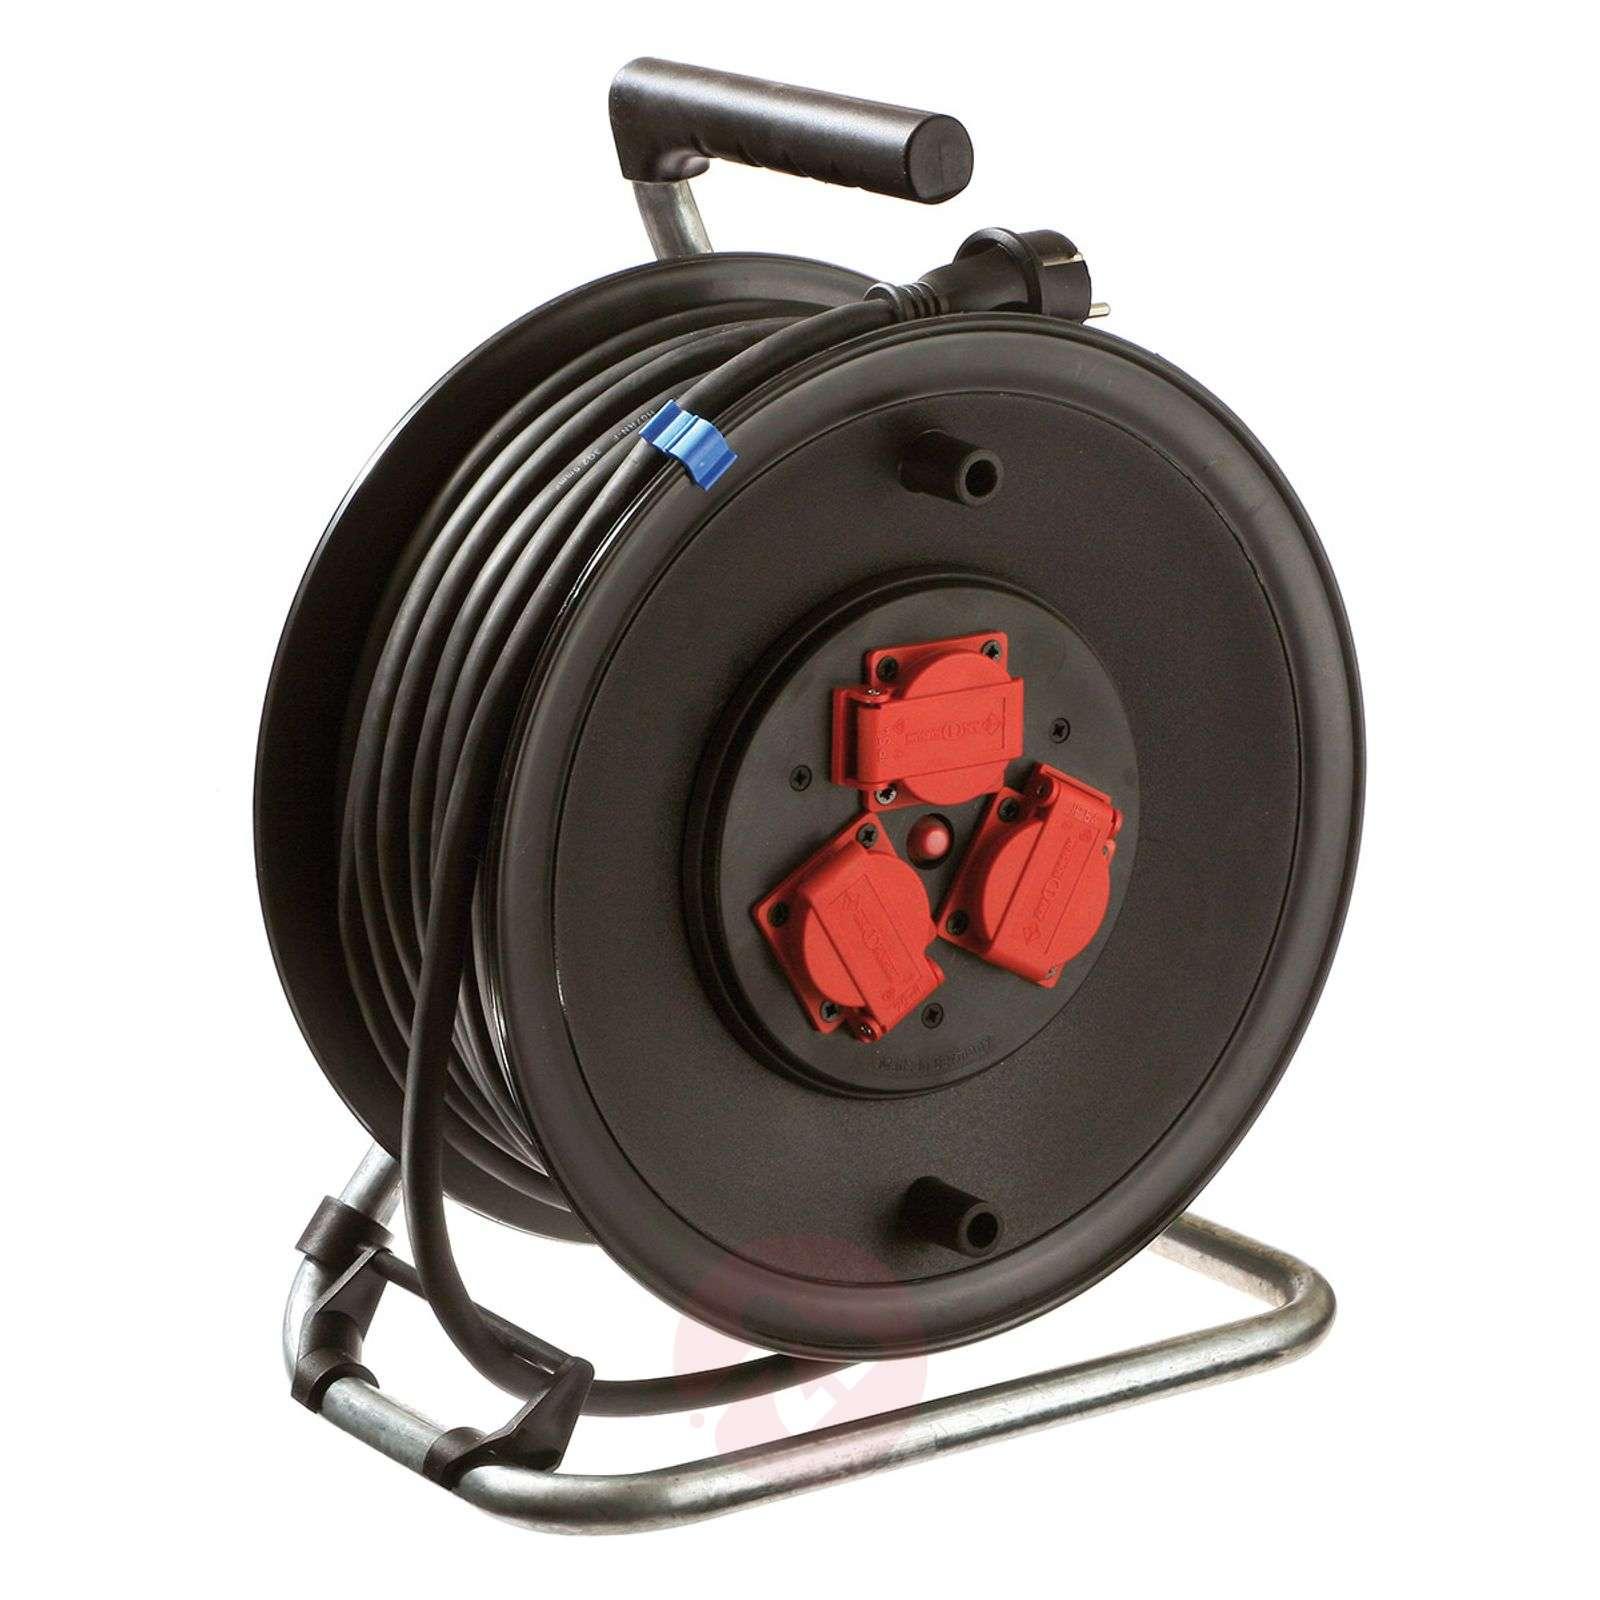 Professional cable drum BGI 608 for building sites-4535119X-01